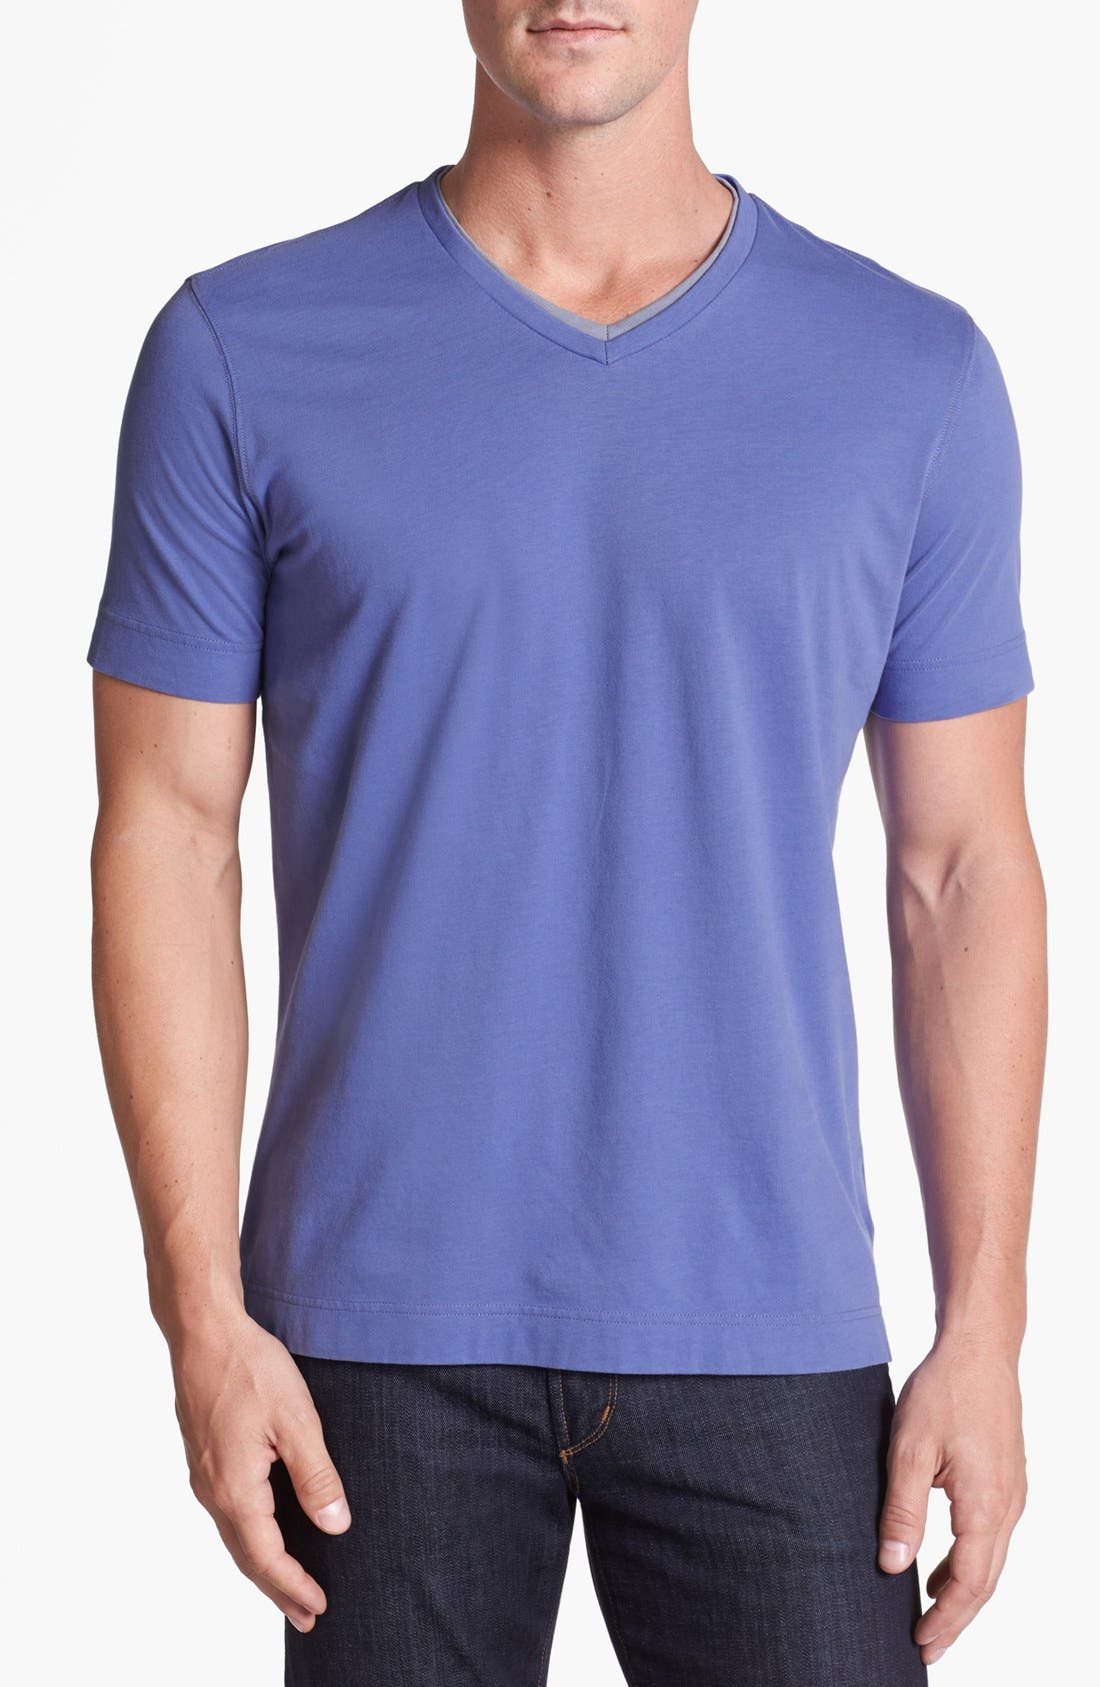 Main Image - Robert Barakett 'Adam' Double V-Neck T-Shirt